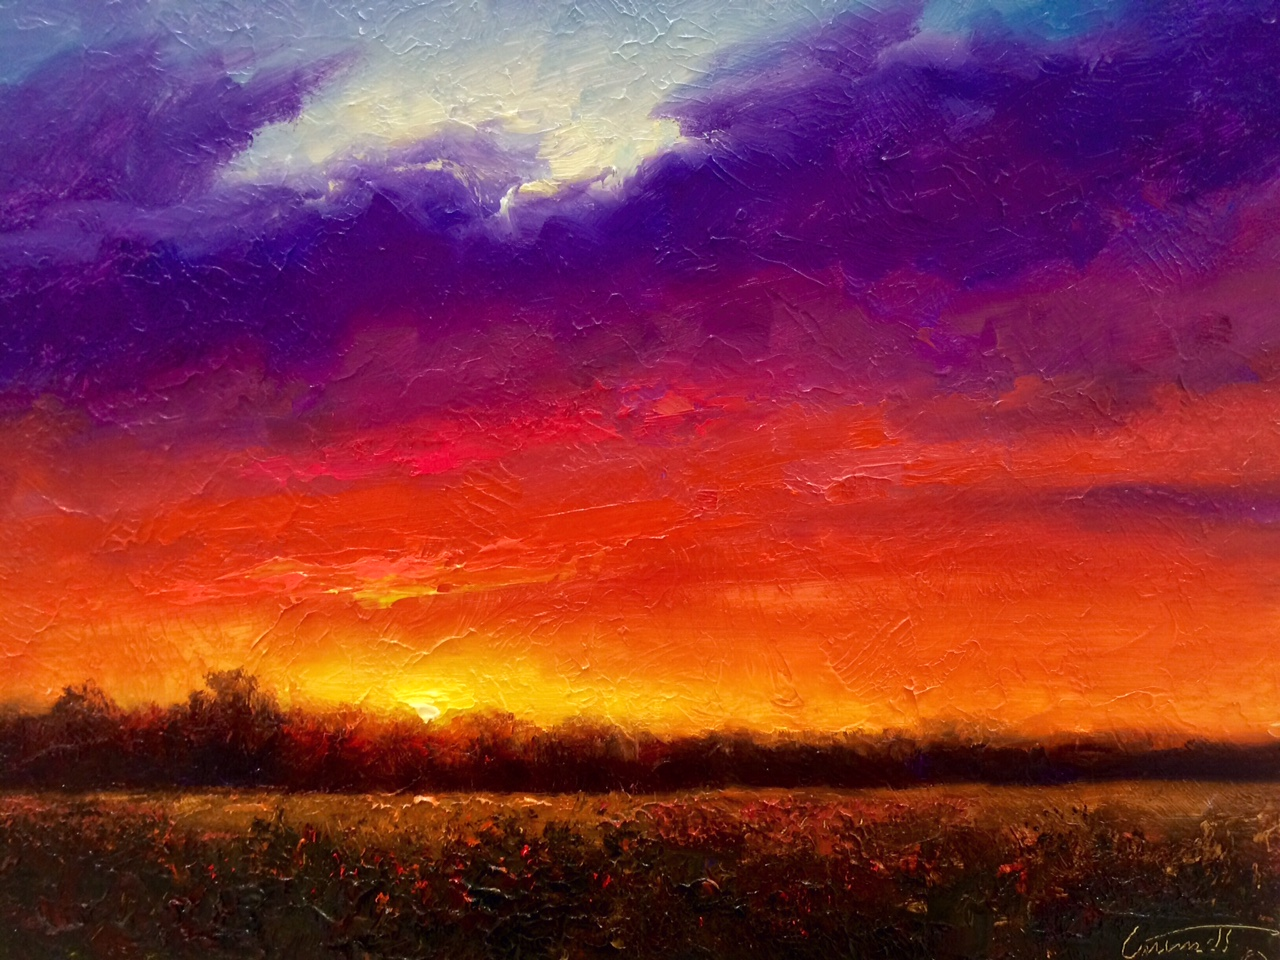 Sky Fire Evening Sunset Painting